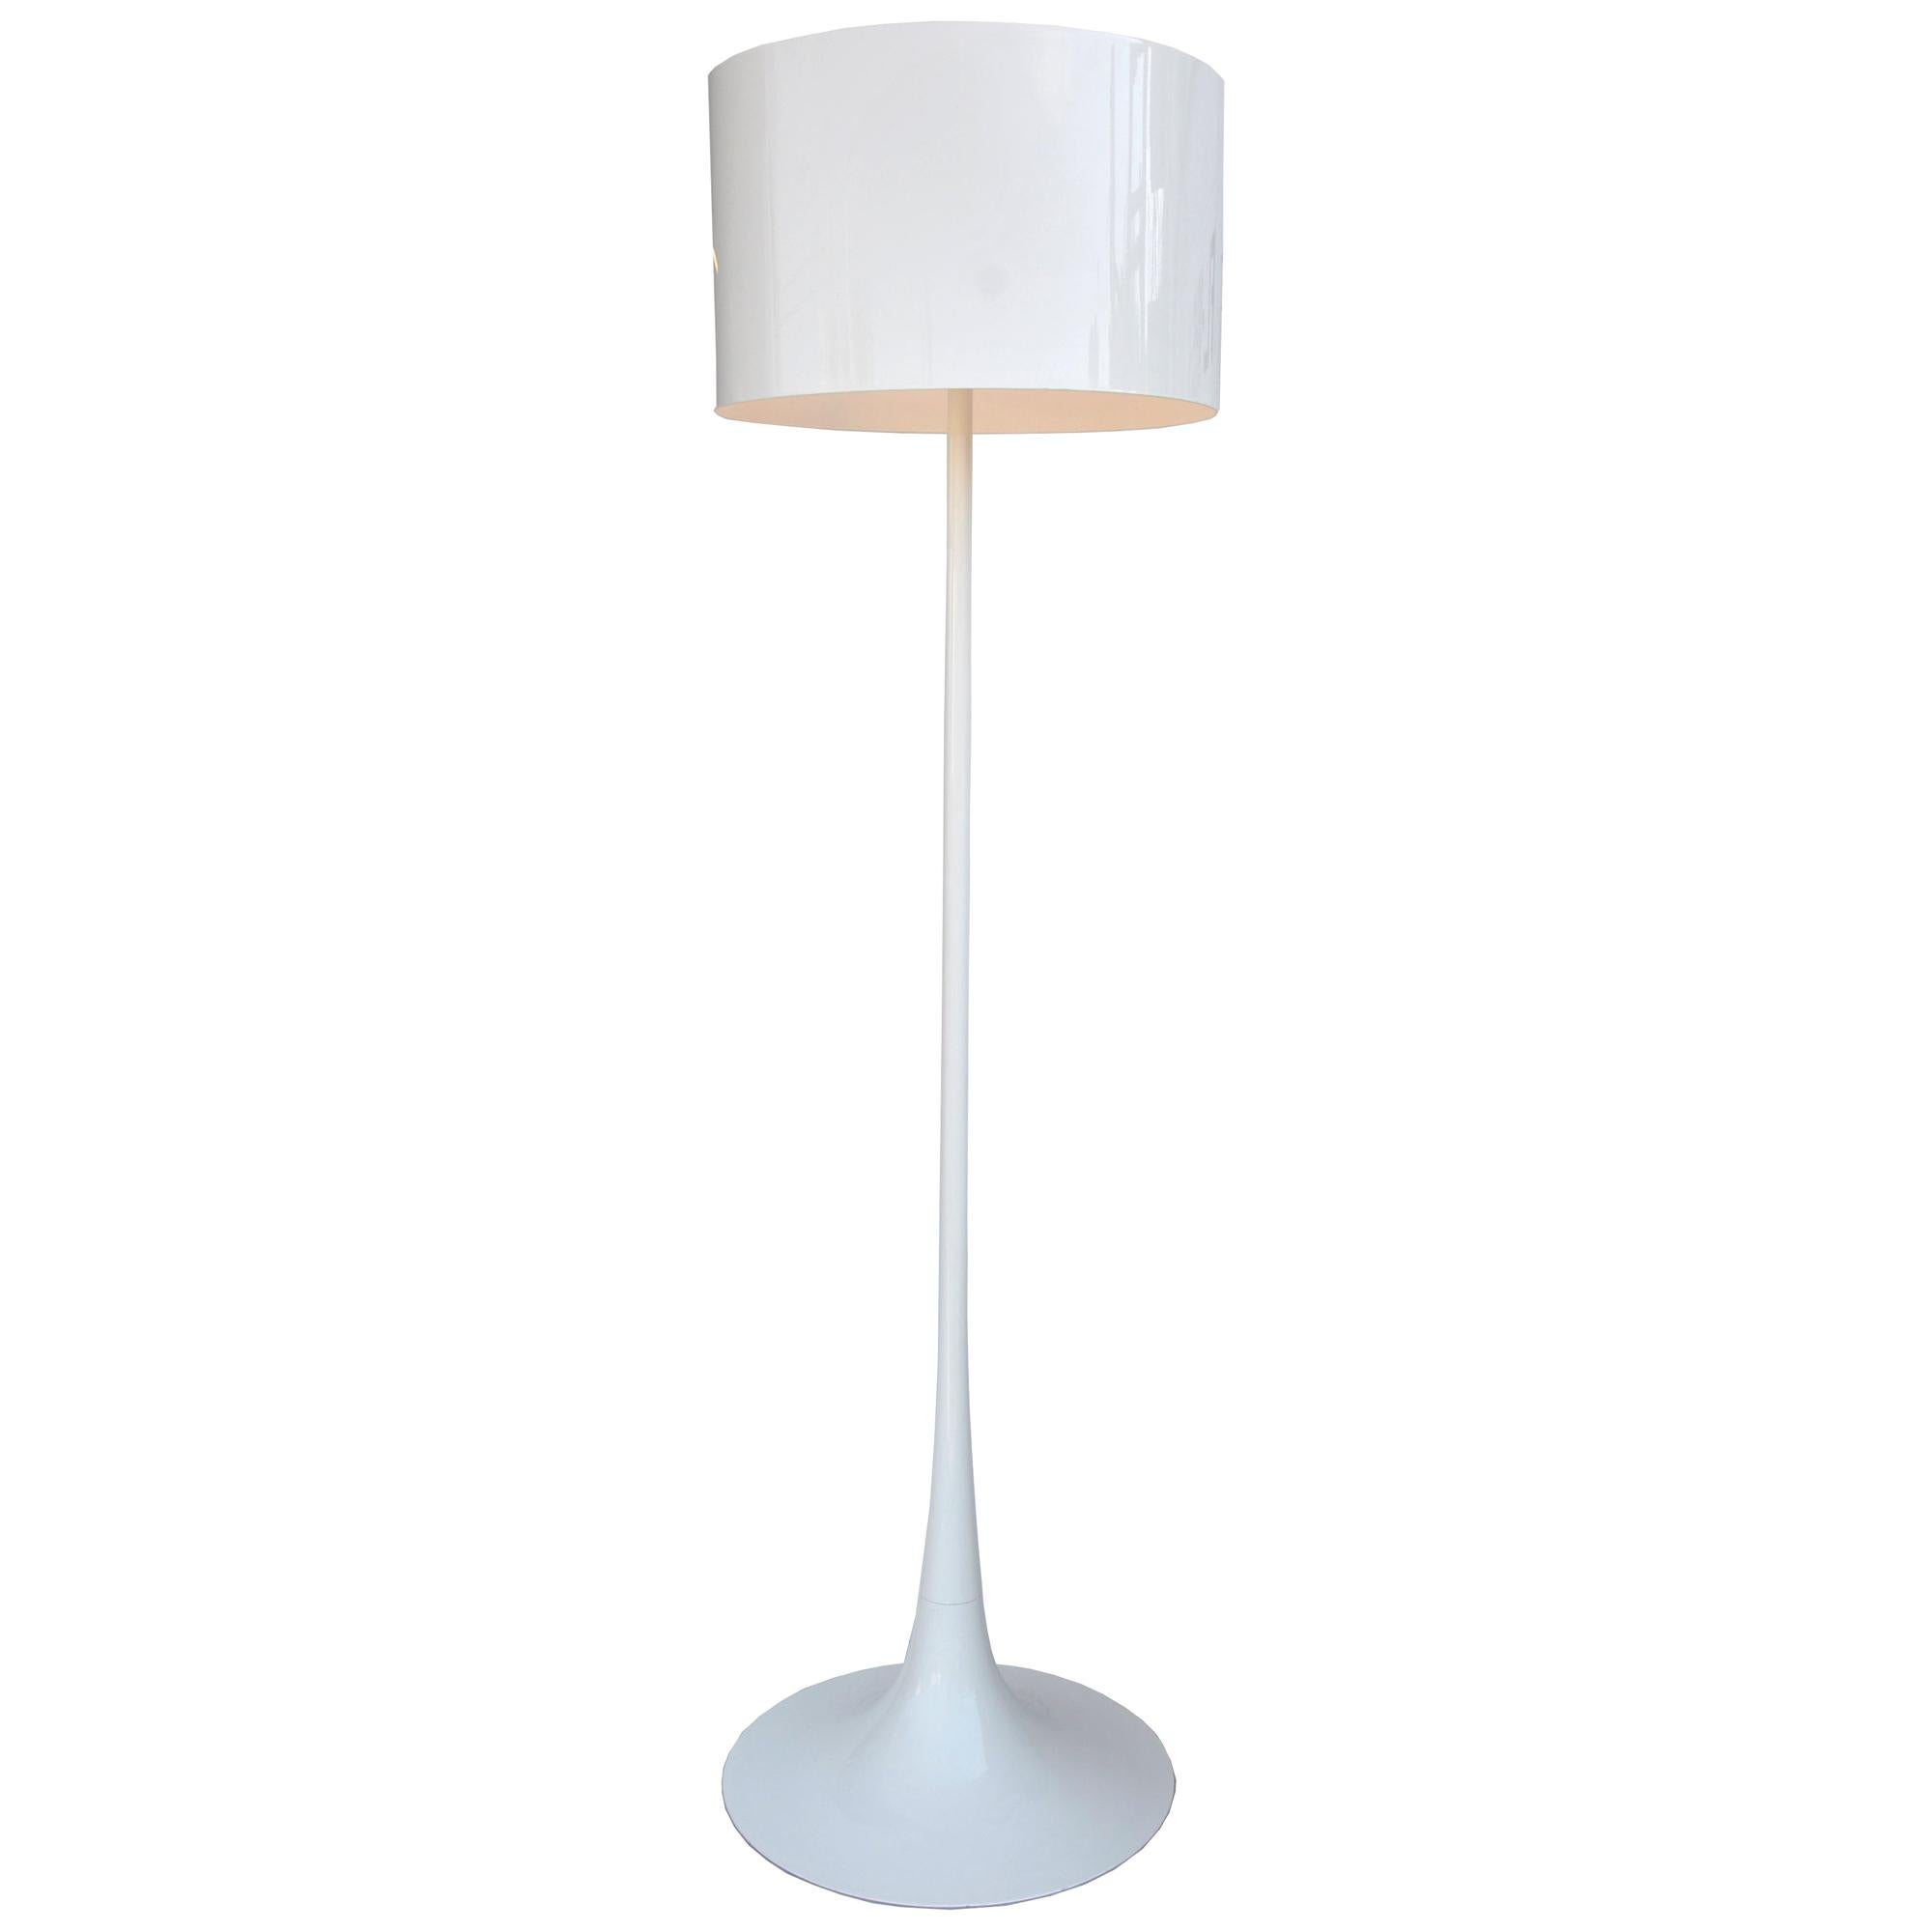 1 Flos Spun Light Floor Lamp by Sebastian Wong